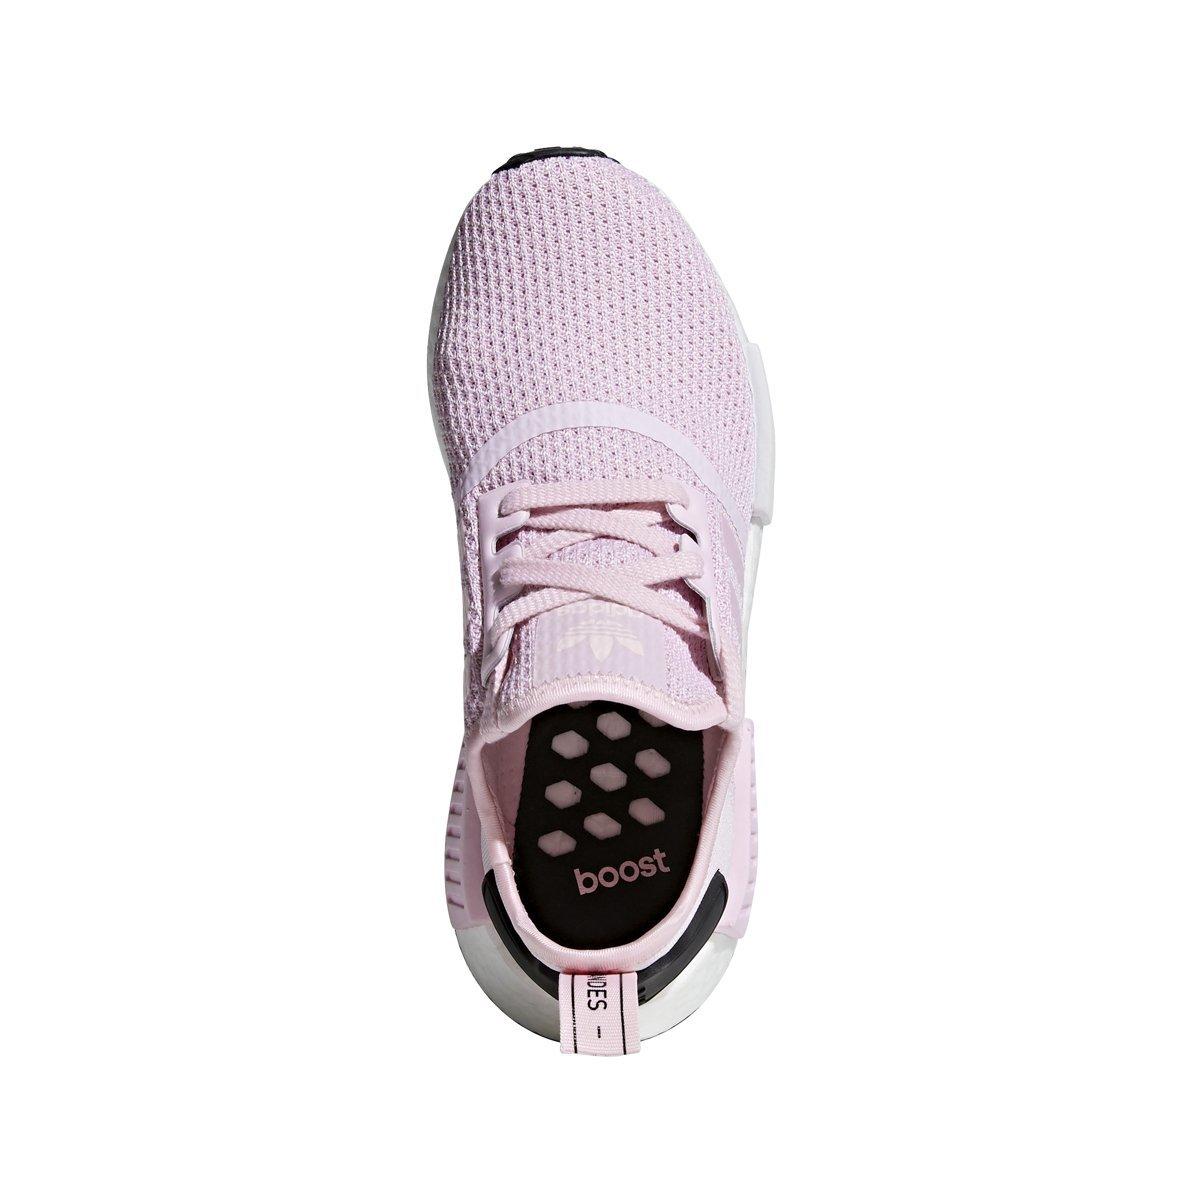 Adidas NMD_r1 PK, Scarpe da Fitness Uomo Uomo Uomo | A Basso Prezzo  ee109f